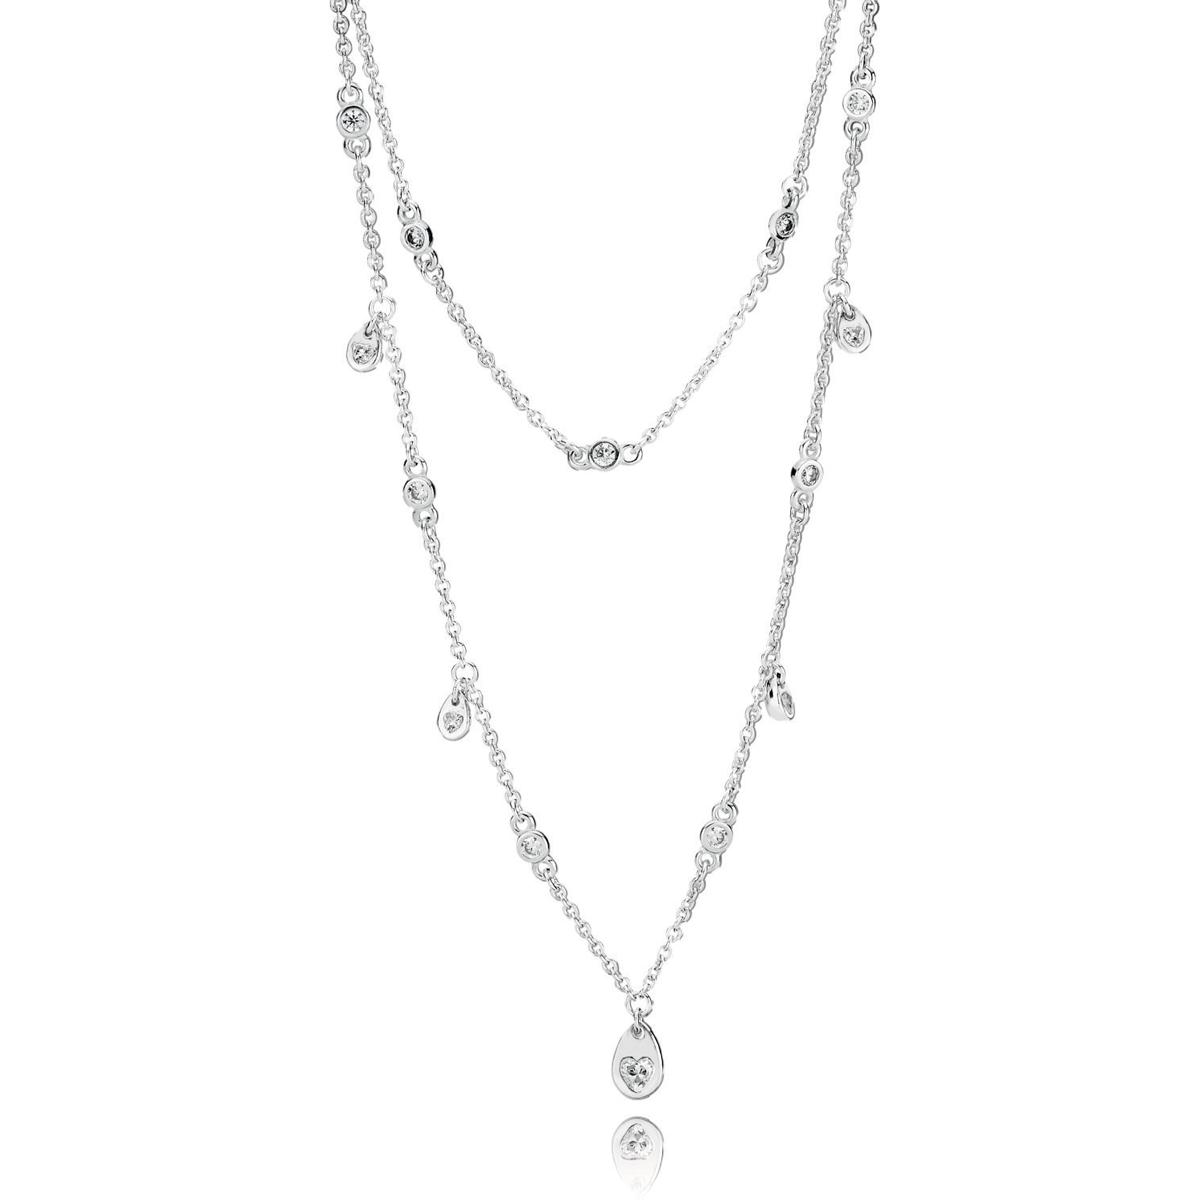 Pandora chandelier droplets necklace pancharmbracelets pandora chandelier droplets necklace pandora chandelier droplets necklace aloadofball Gallery